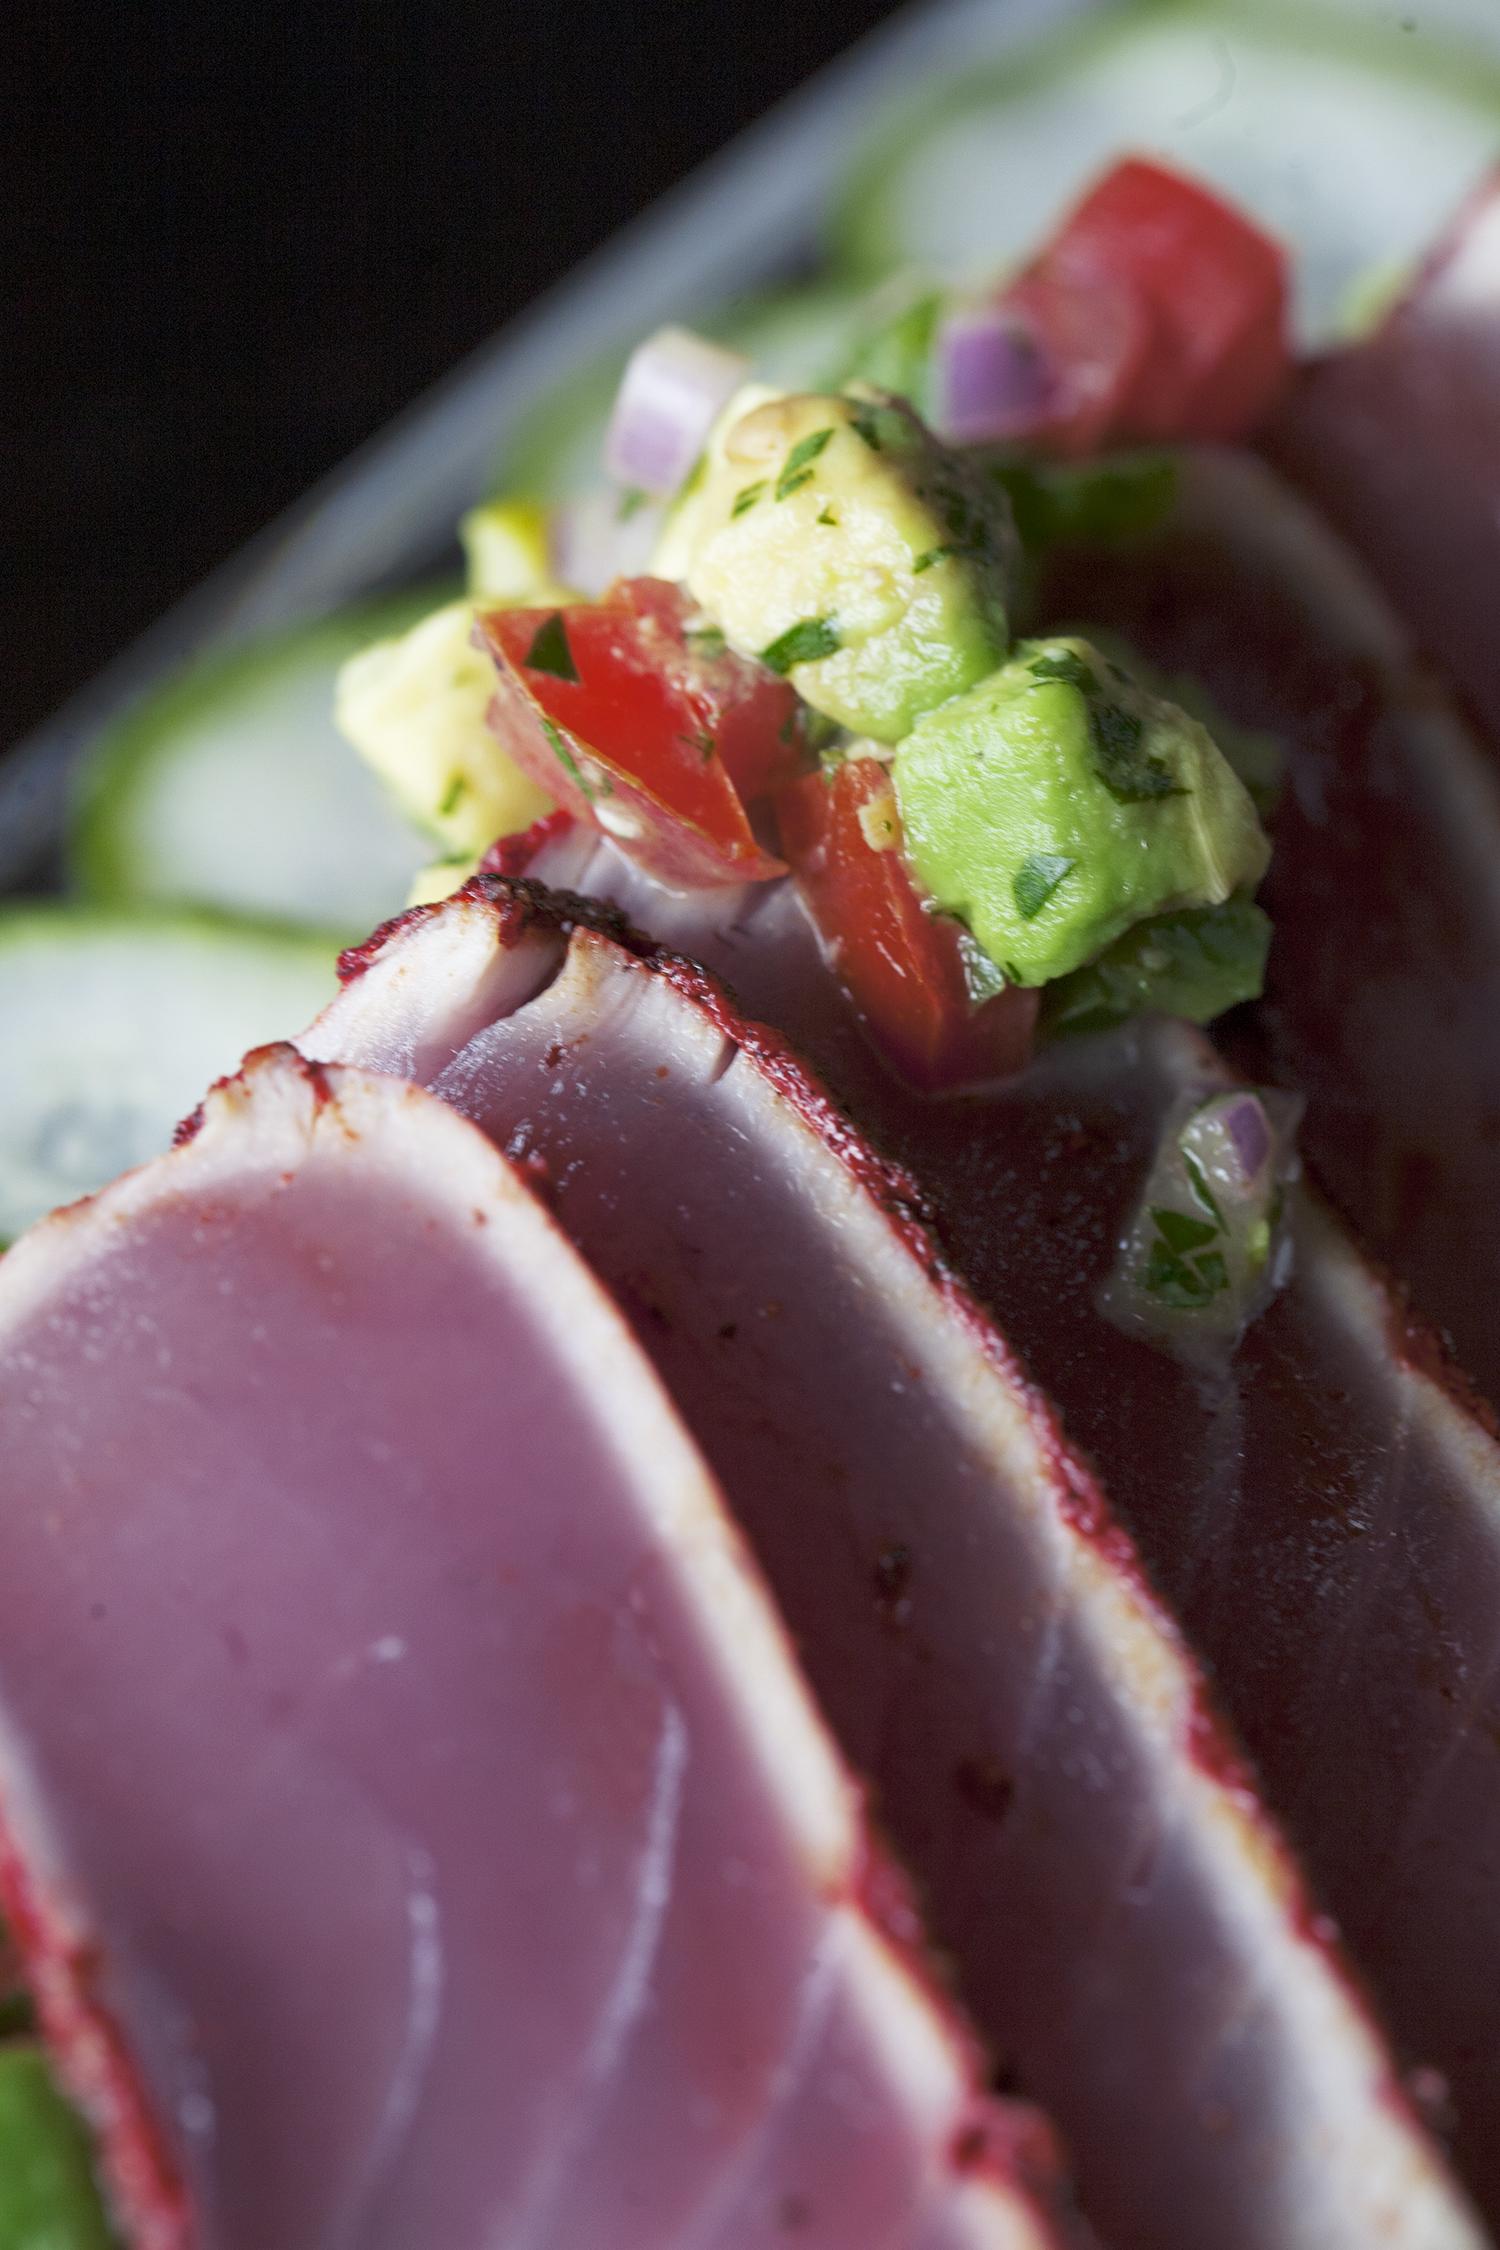 Adobo Rubbed Seared Ahi Tuna with Avocado Salad and Cucumber